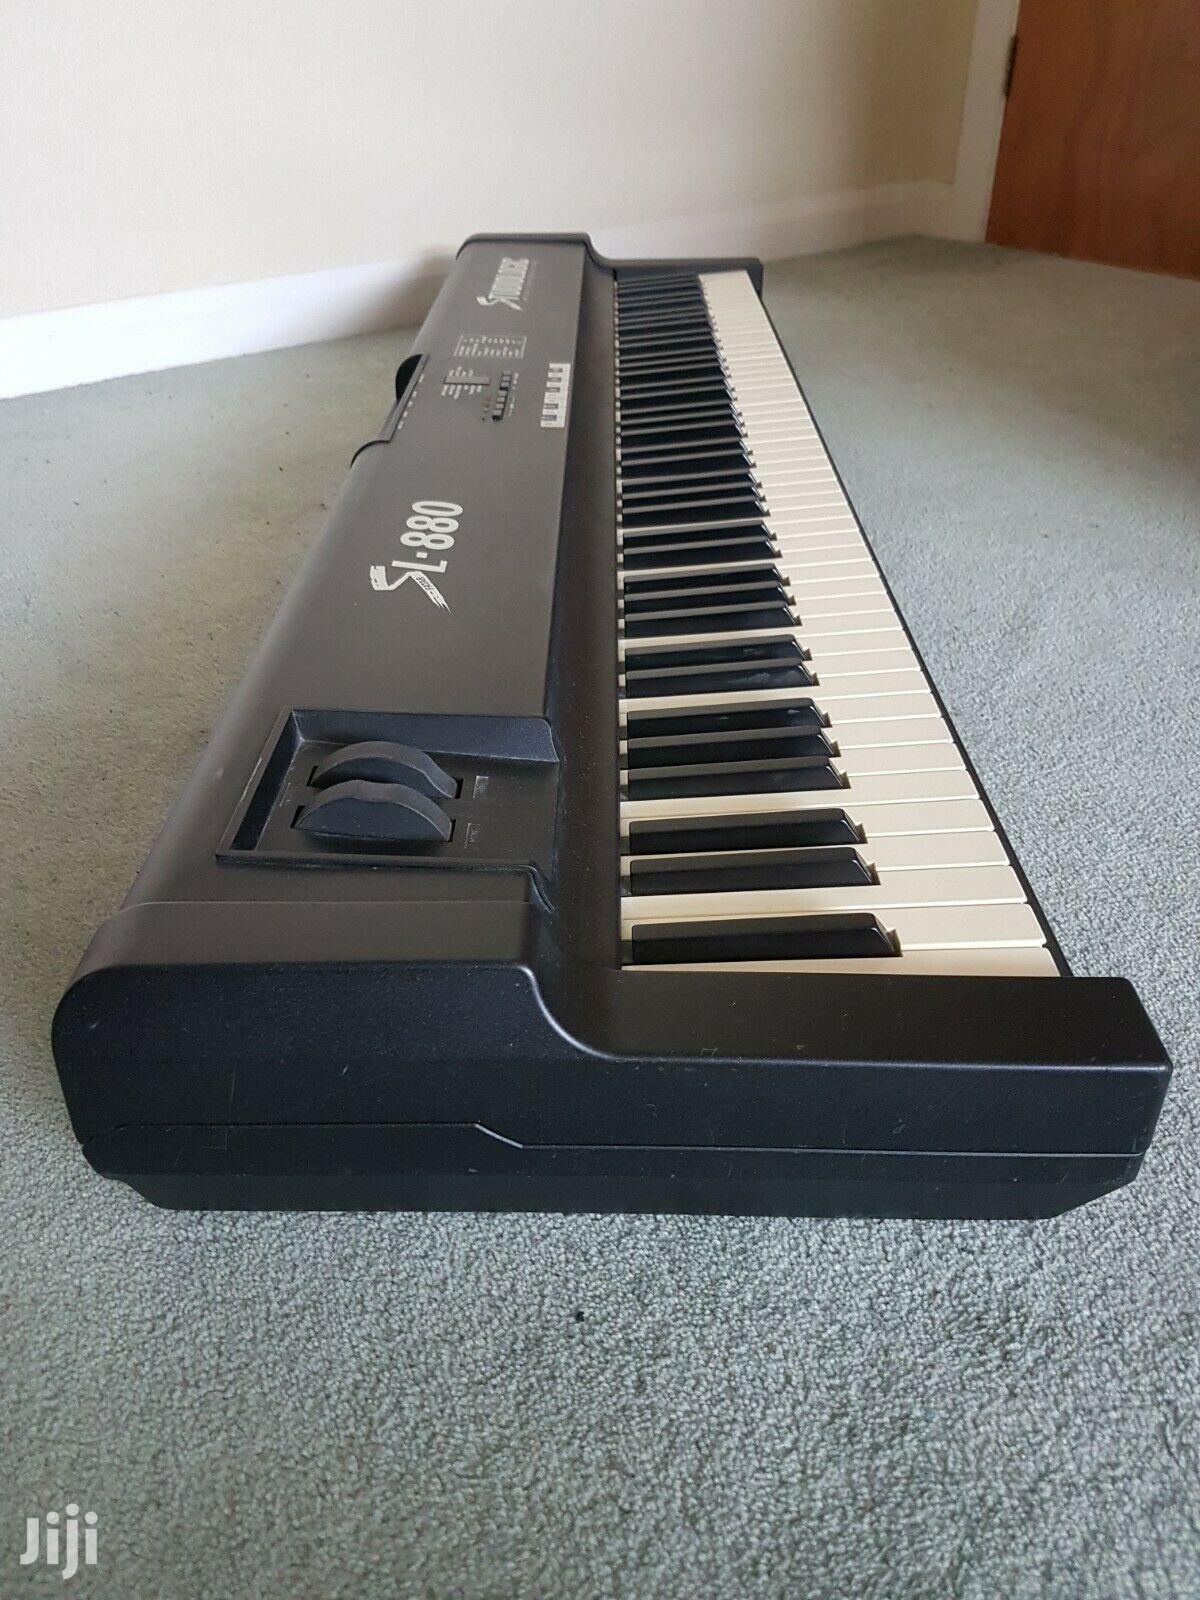 Studiologic SL-880 88-Key Piano Hammer Action MIDI Keyboard | Musical Instruments & Gear for sale in Adenta Municipal, Greater Accra, Ghana